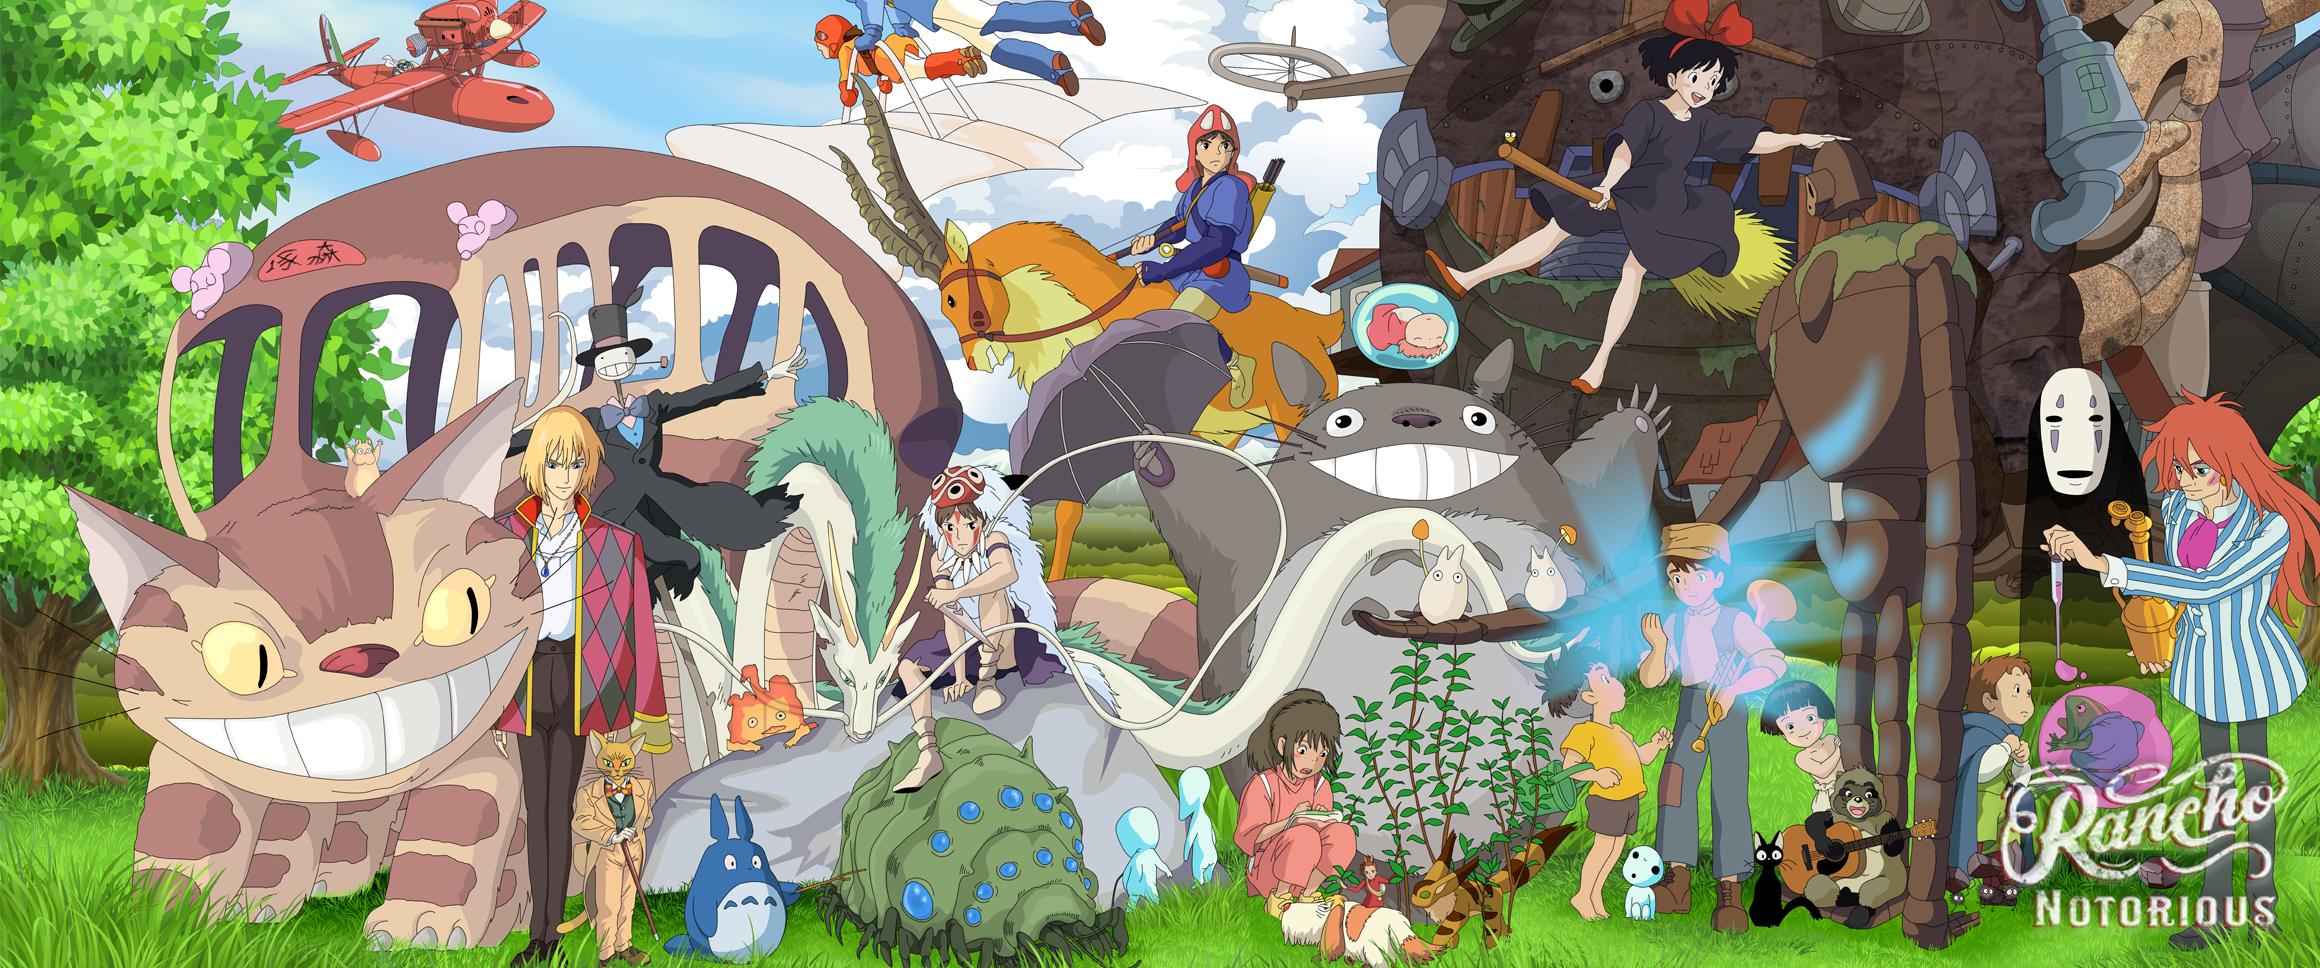 RN 2/2: The All-Star Salute to Studio Ghibli